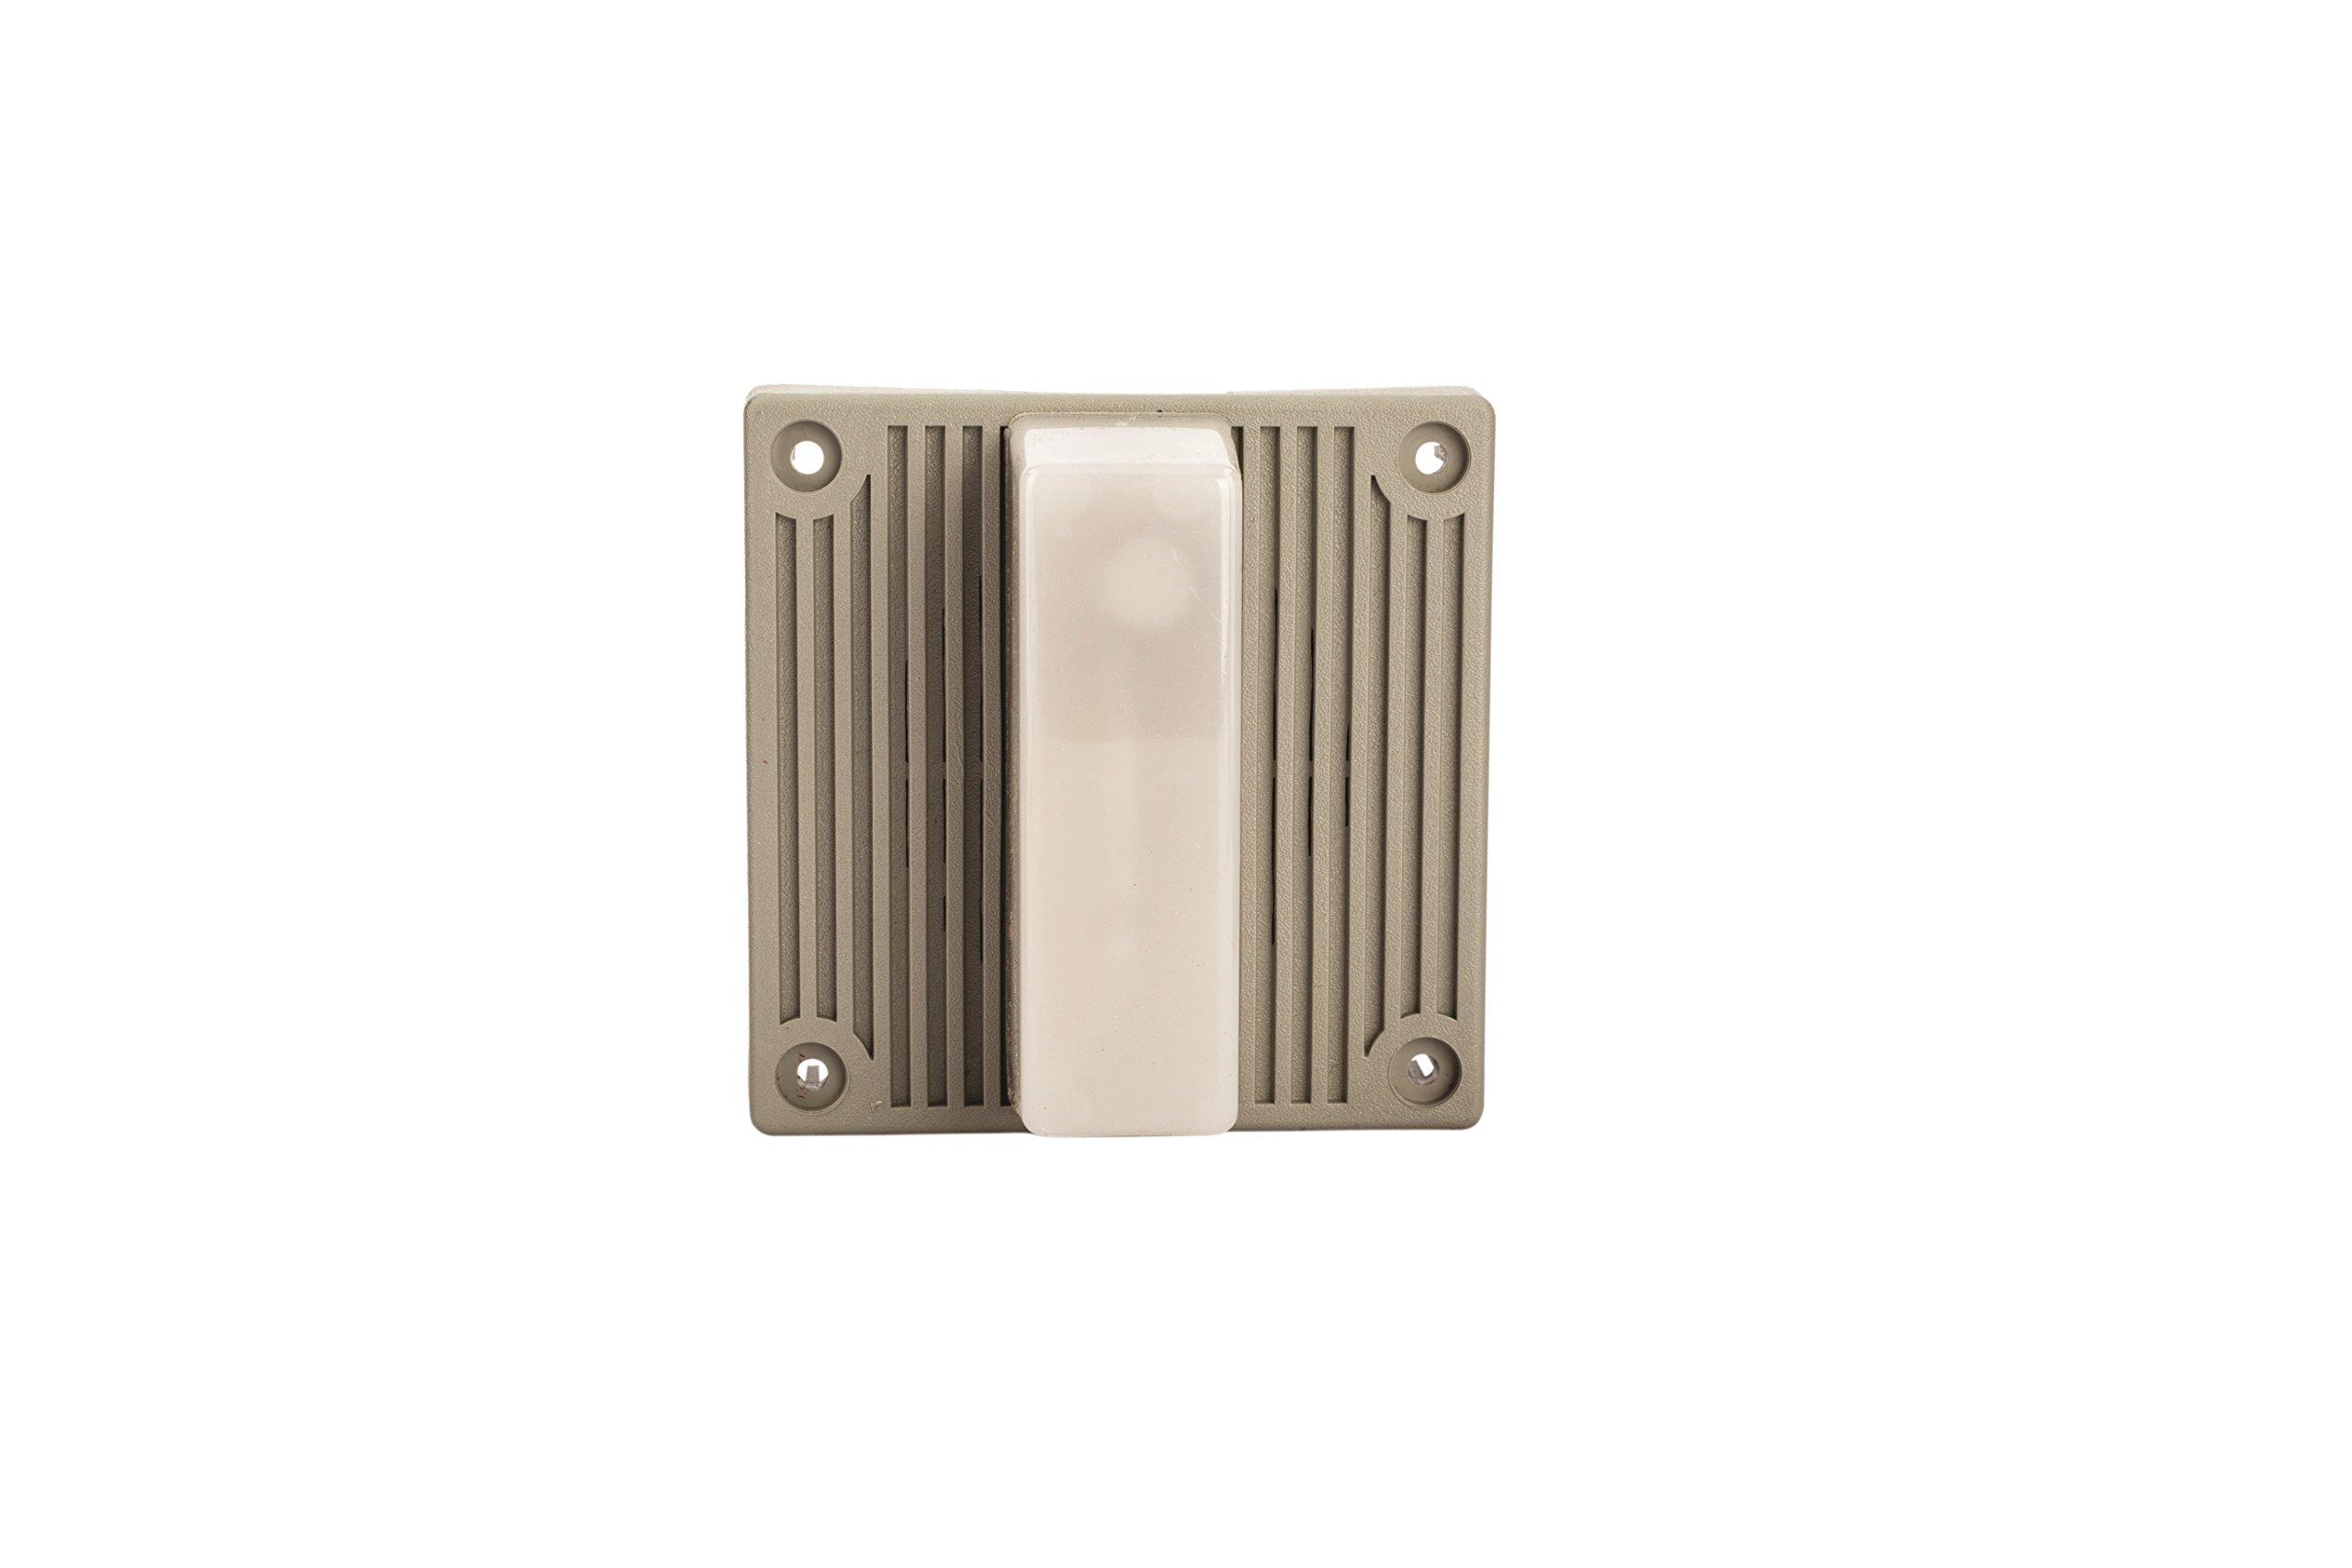 Steel Mechanical Strobe Horn, 120VAC, 0.115 Amp Input Current, 96dB at 10' Range, 15 Candela Intensity